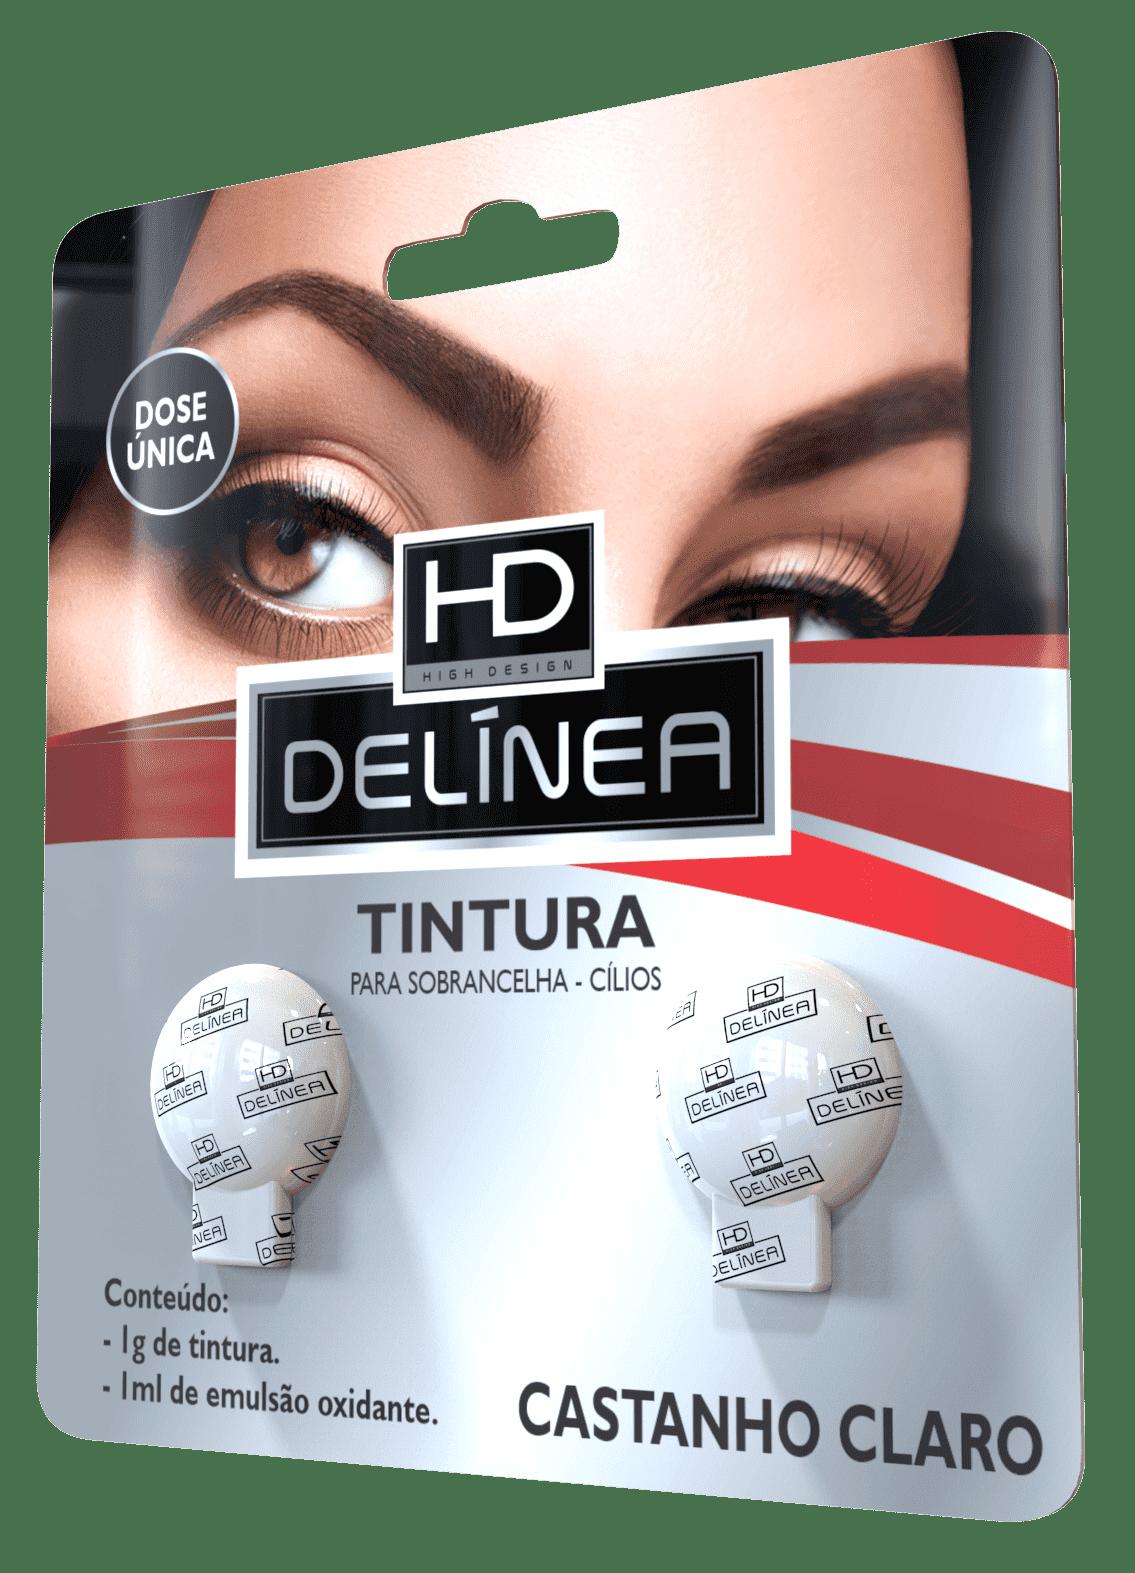 Tintura de Sobrancelhas Delinea HD Dose Única - Castanho Claro